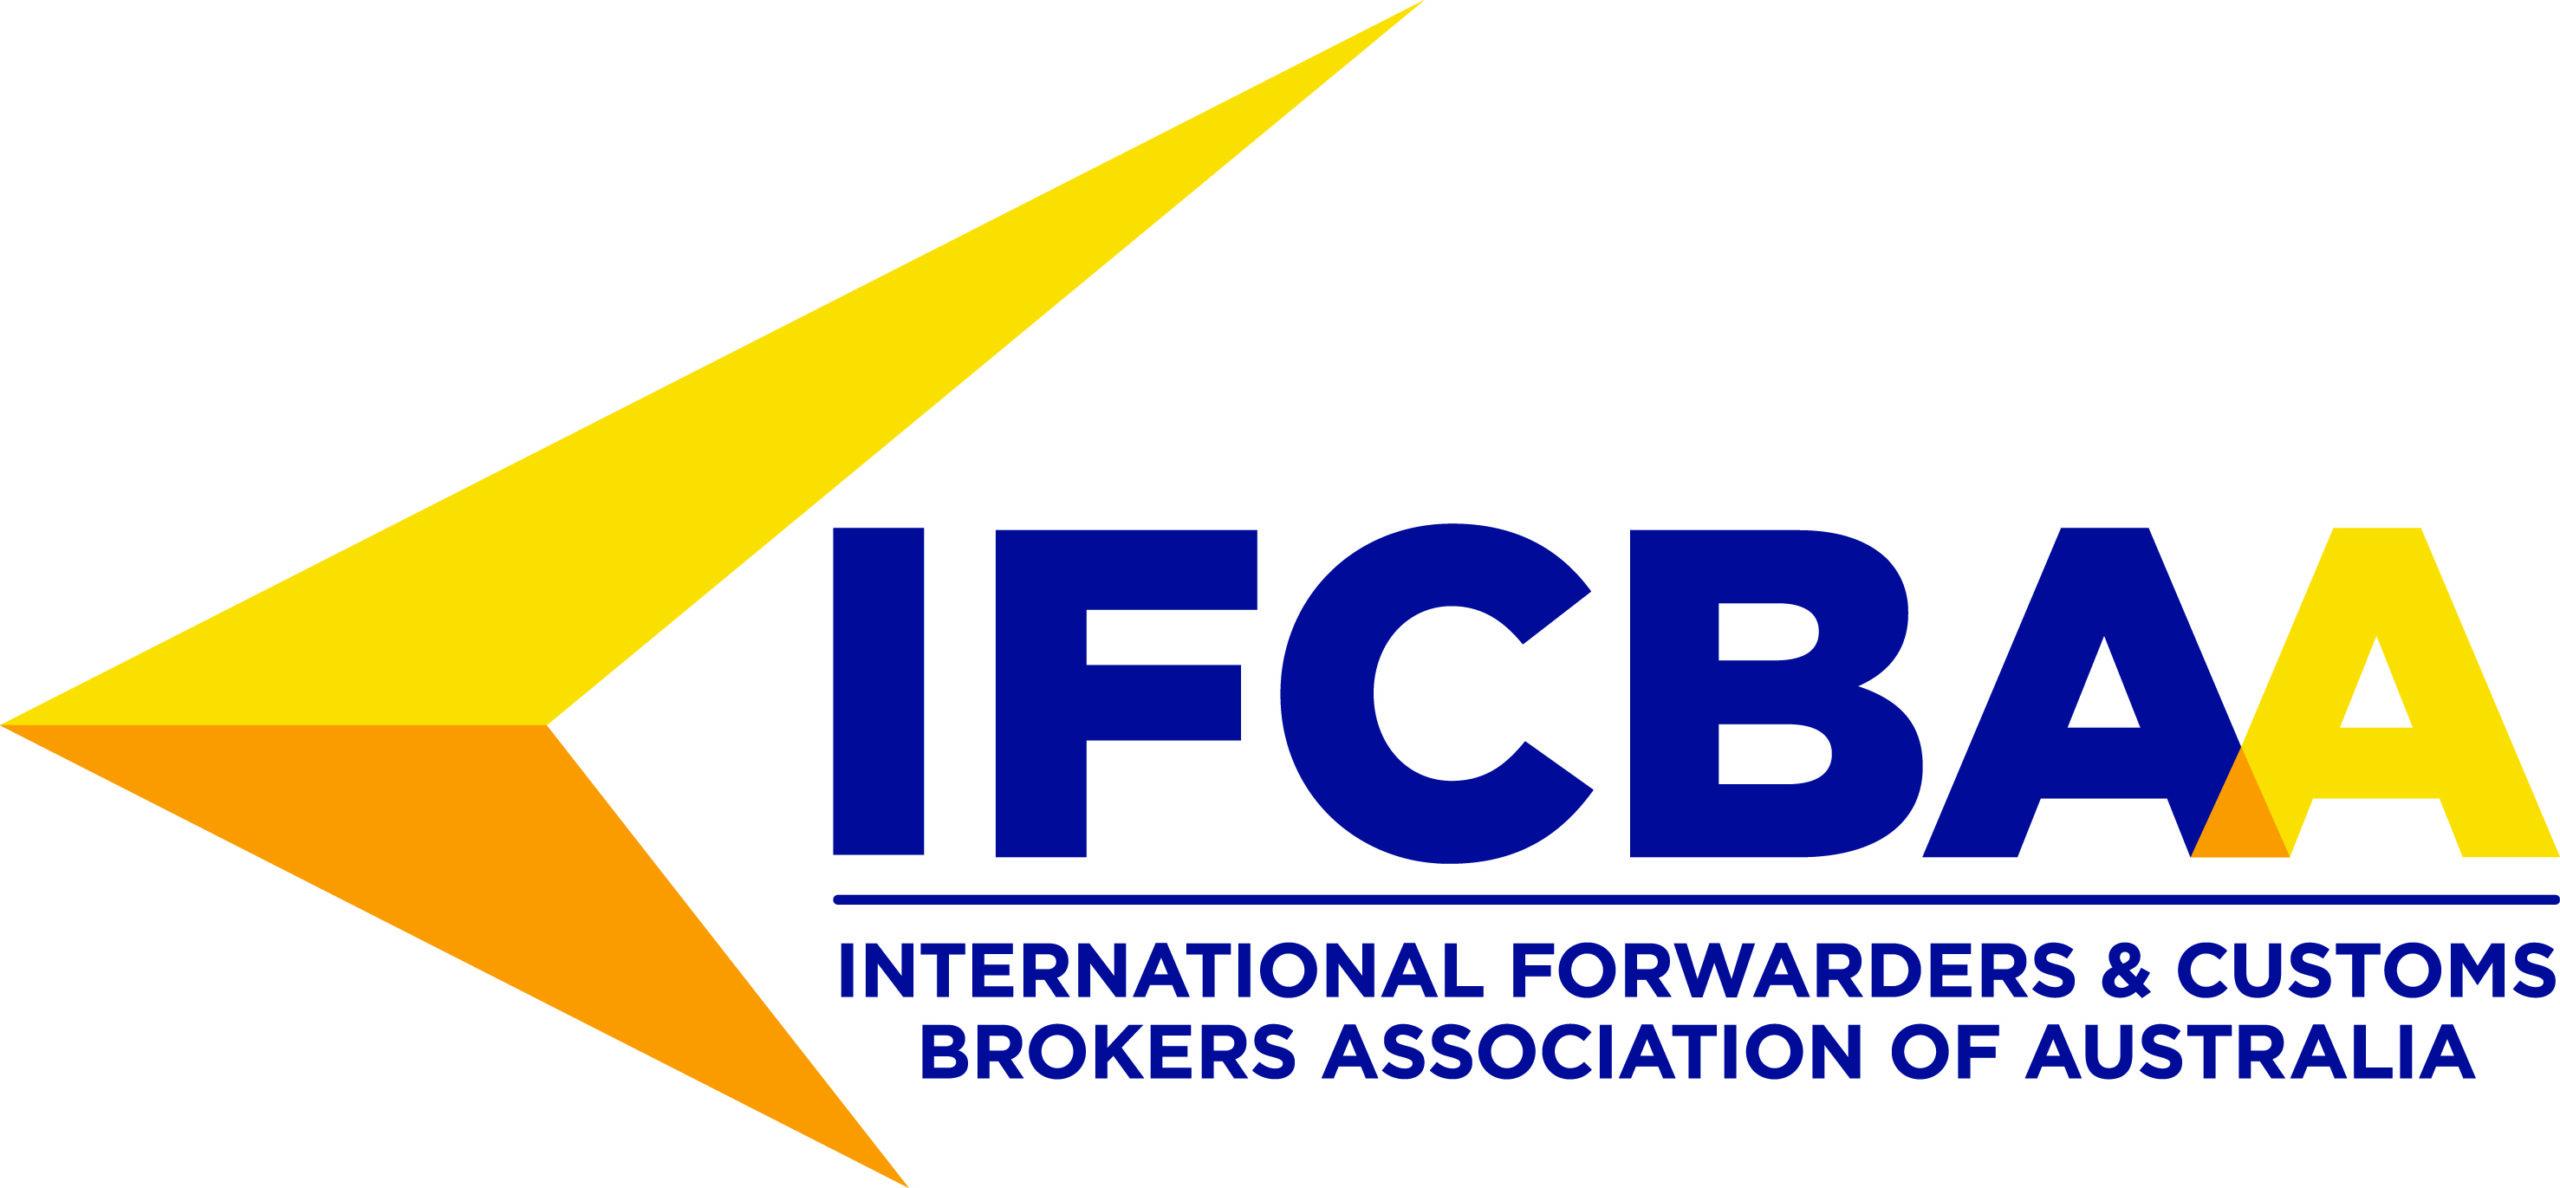 IFCBAA National Conference 2021